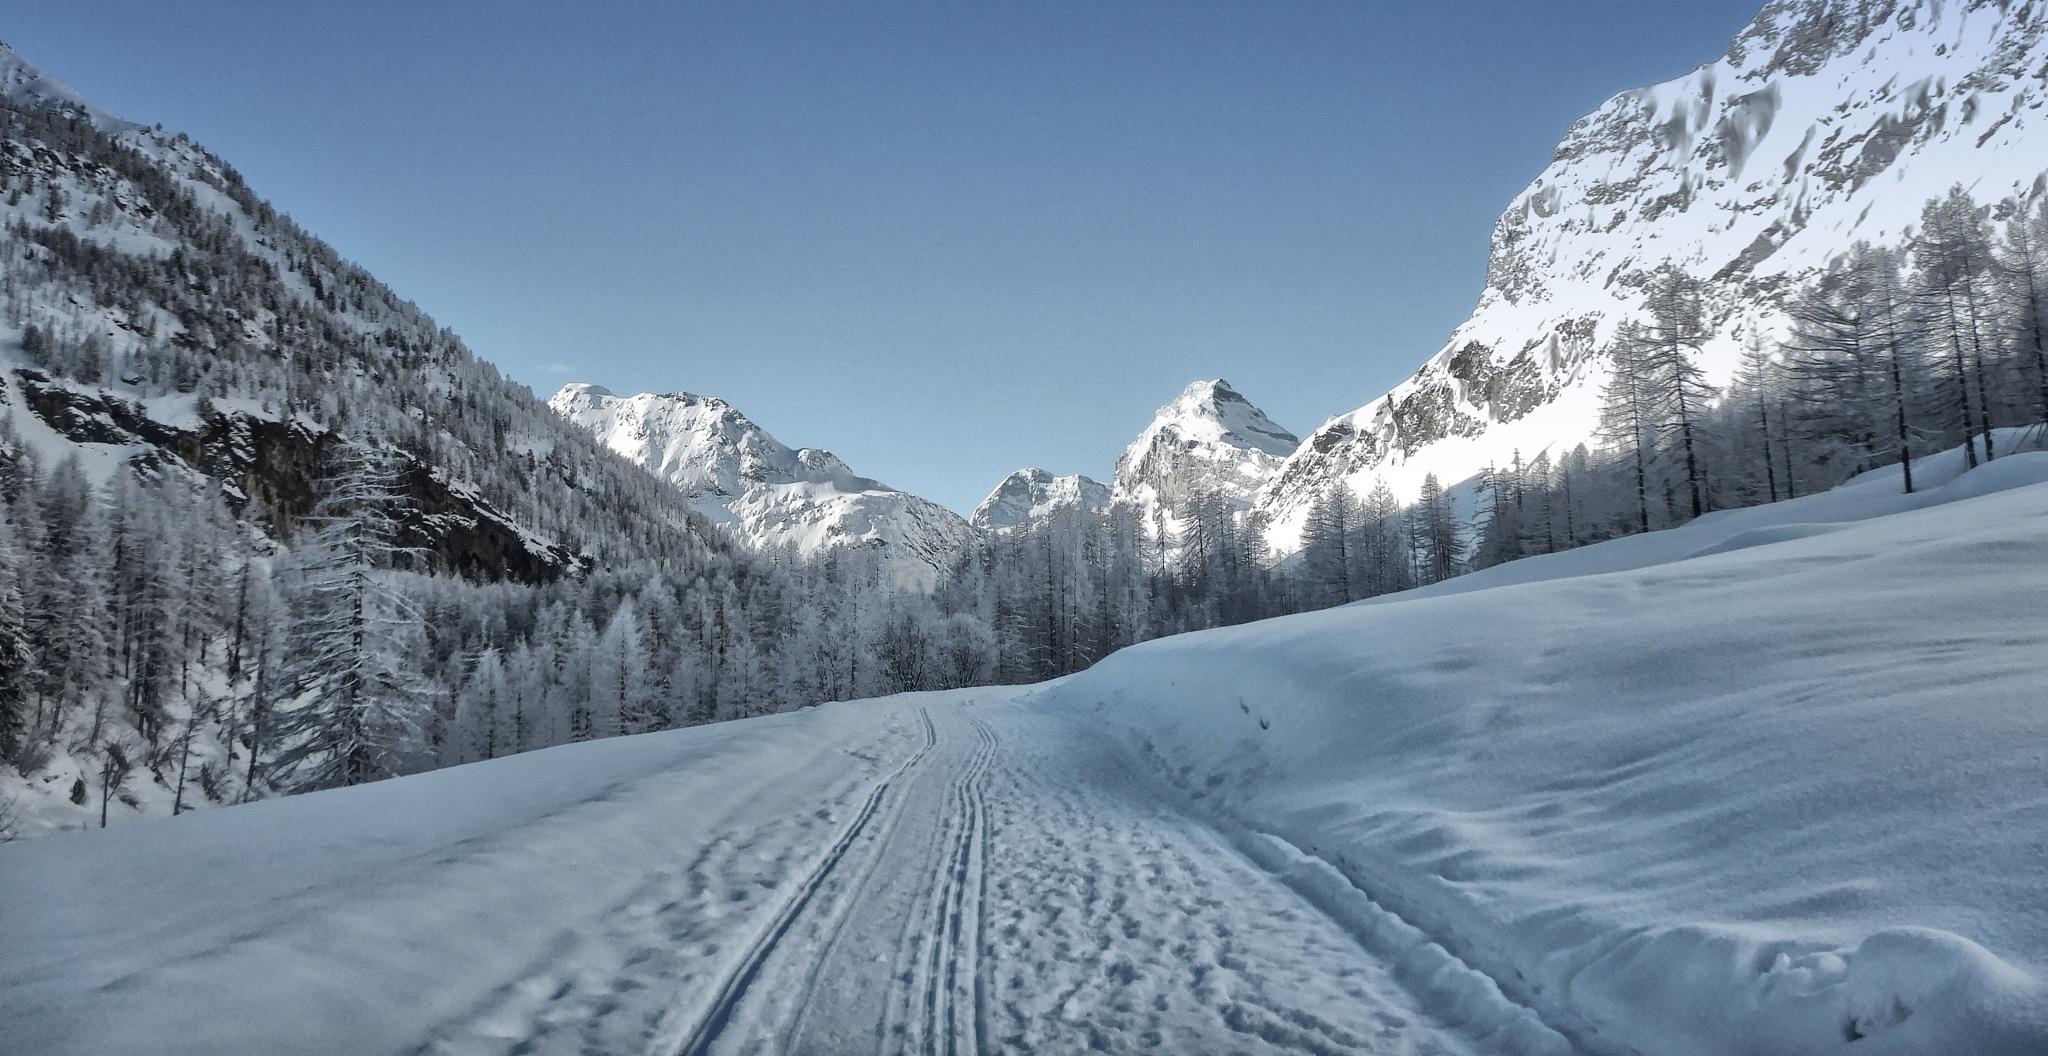 skiing by sunrisesunset